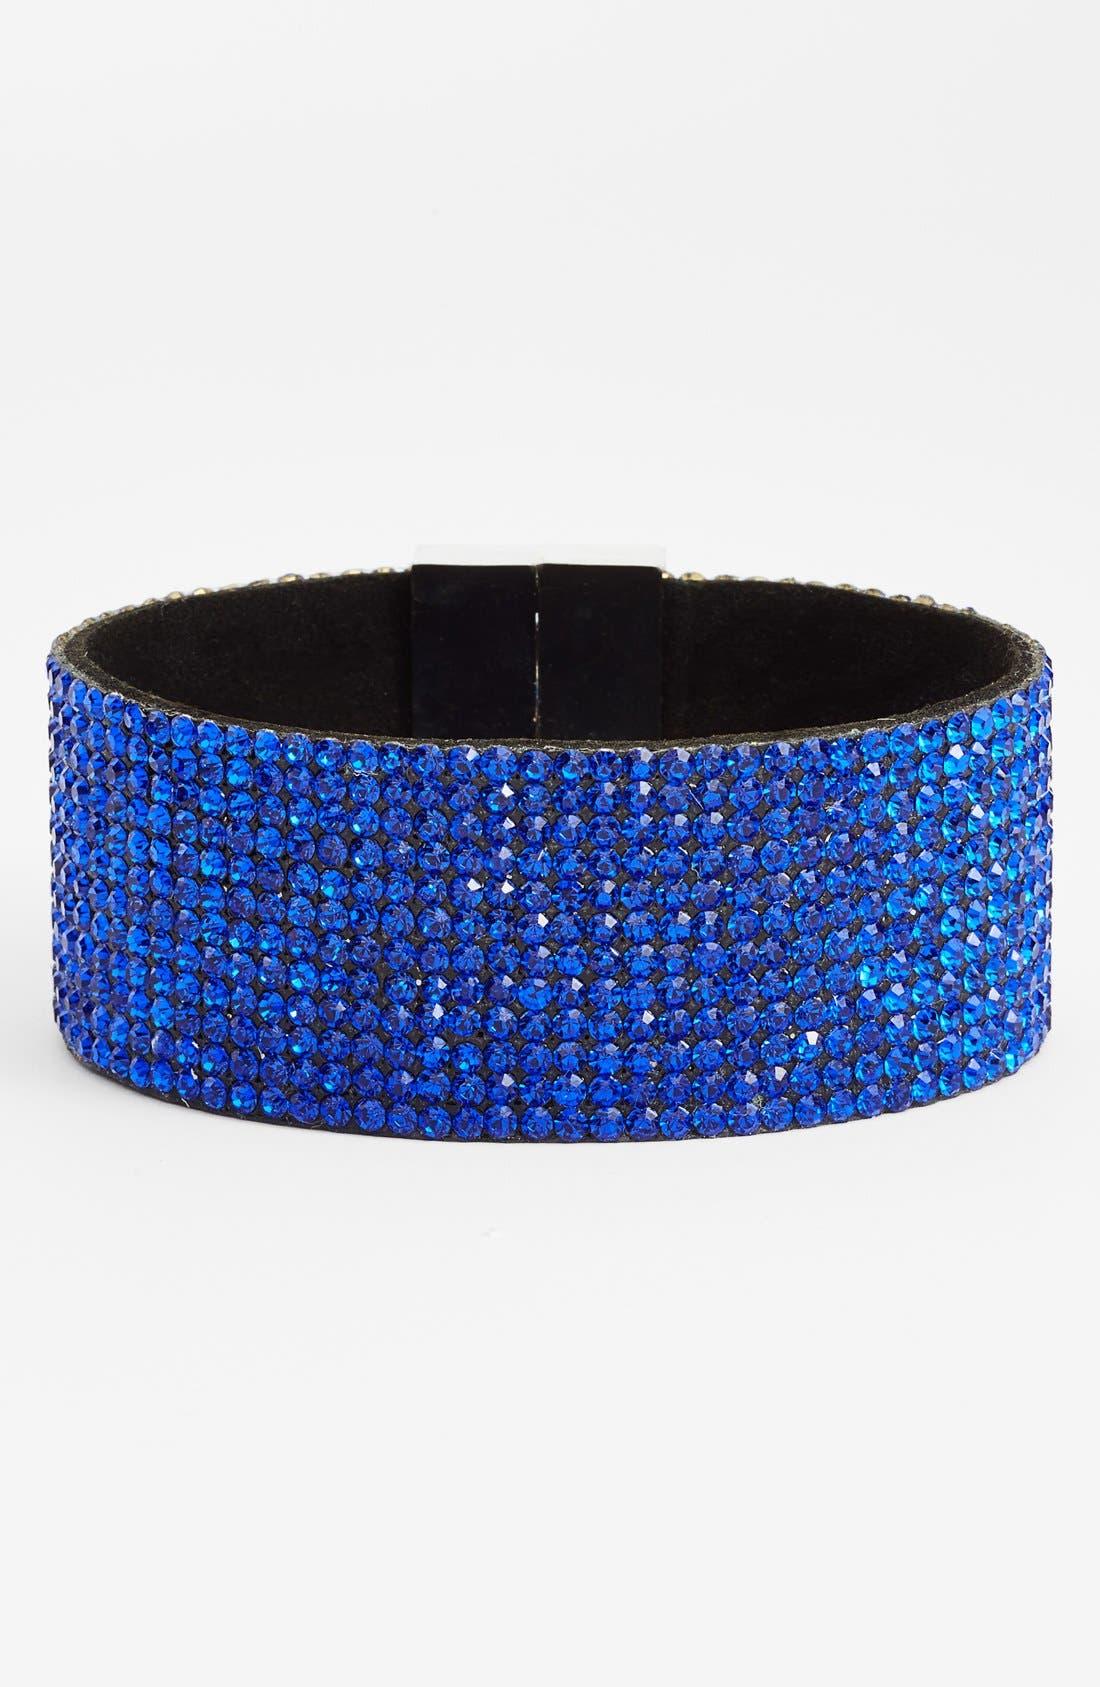 Main Image - Natasha Couture 'Dynasty' Magnetic Cuff Bracelet